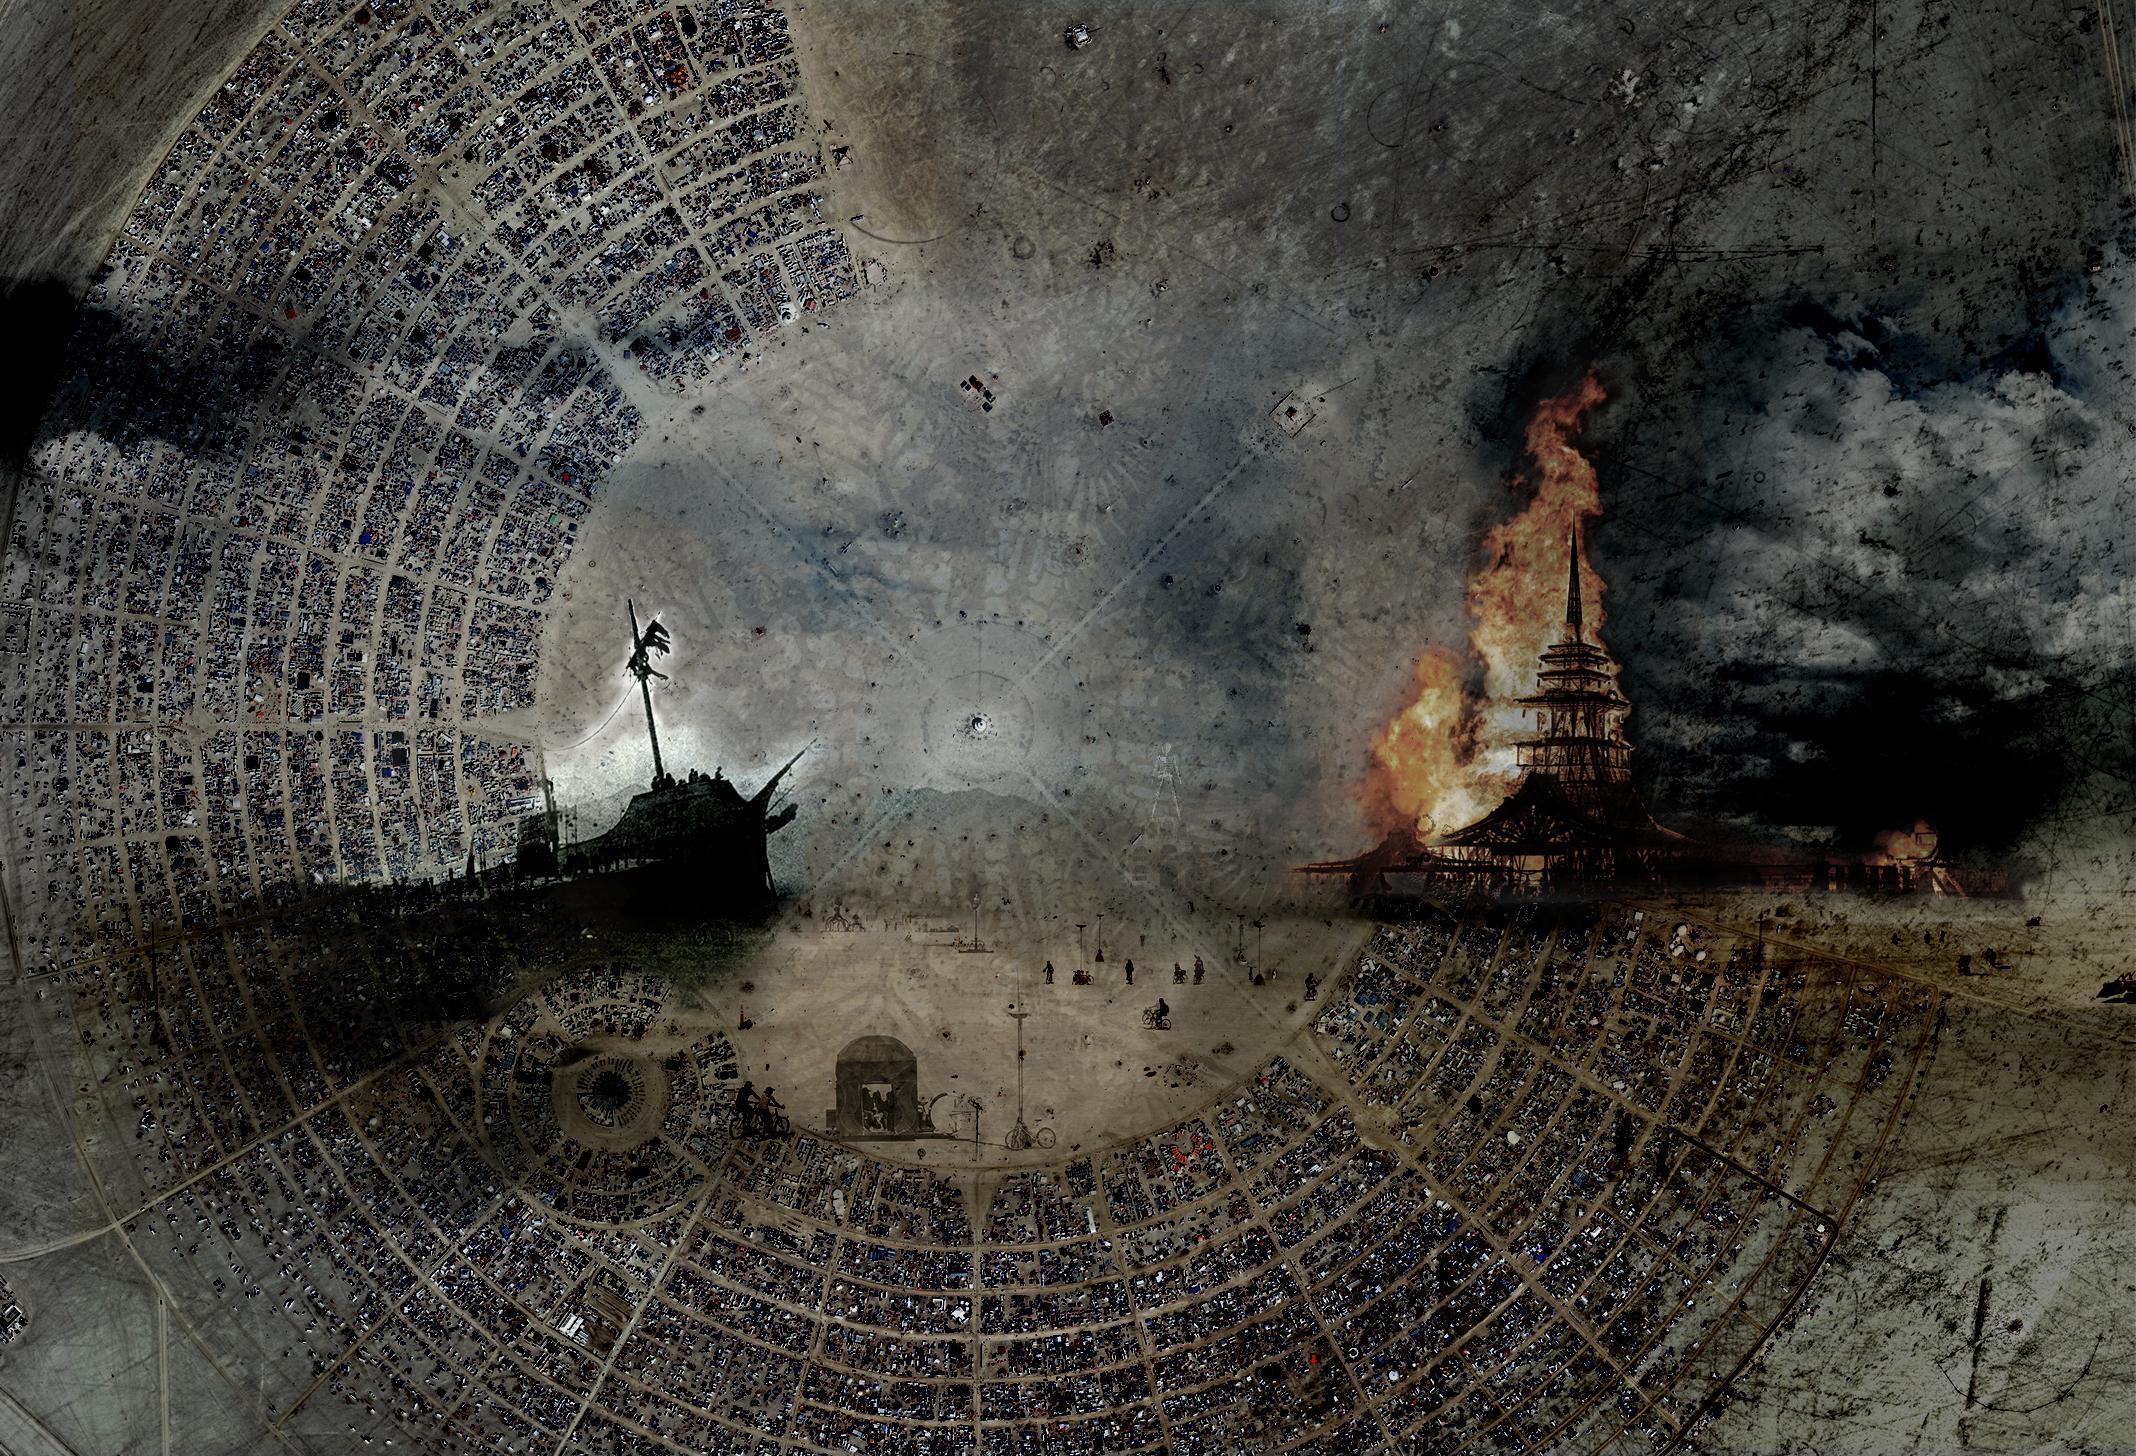 Burning Man - 2012 - Fertility 2.0 by jayswain